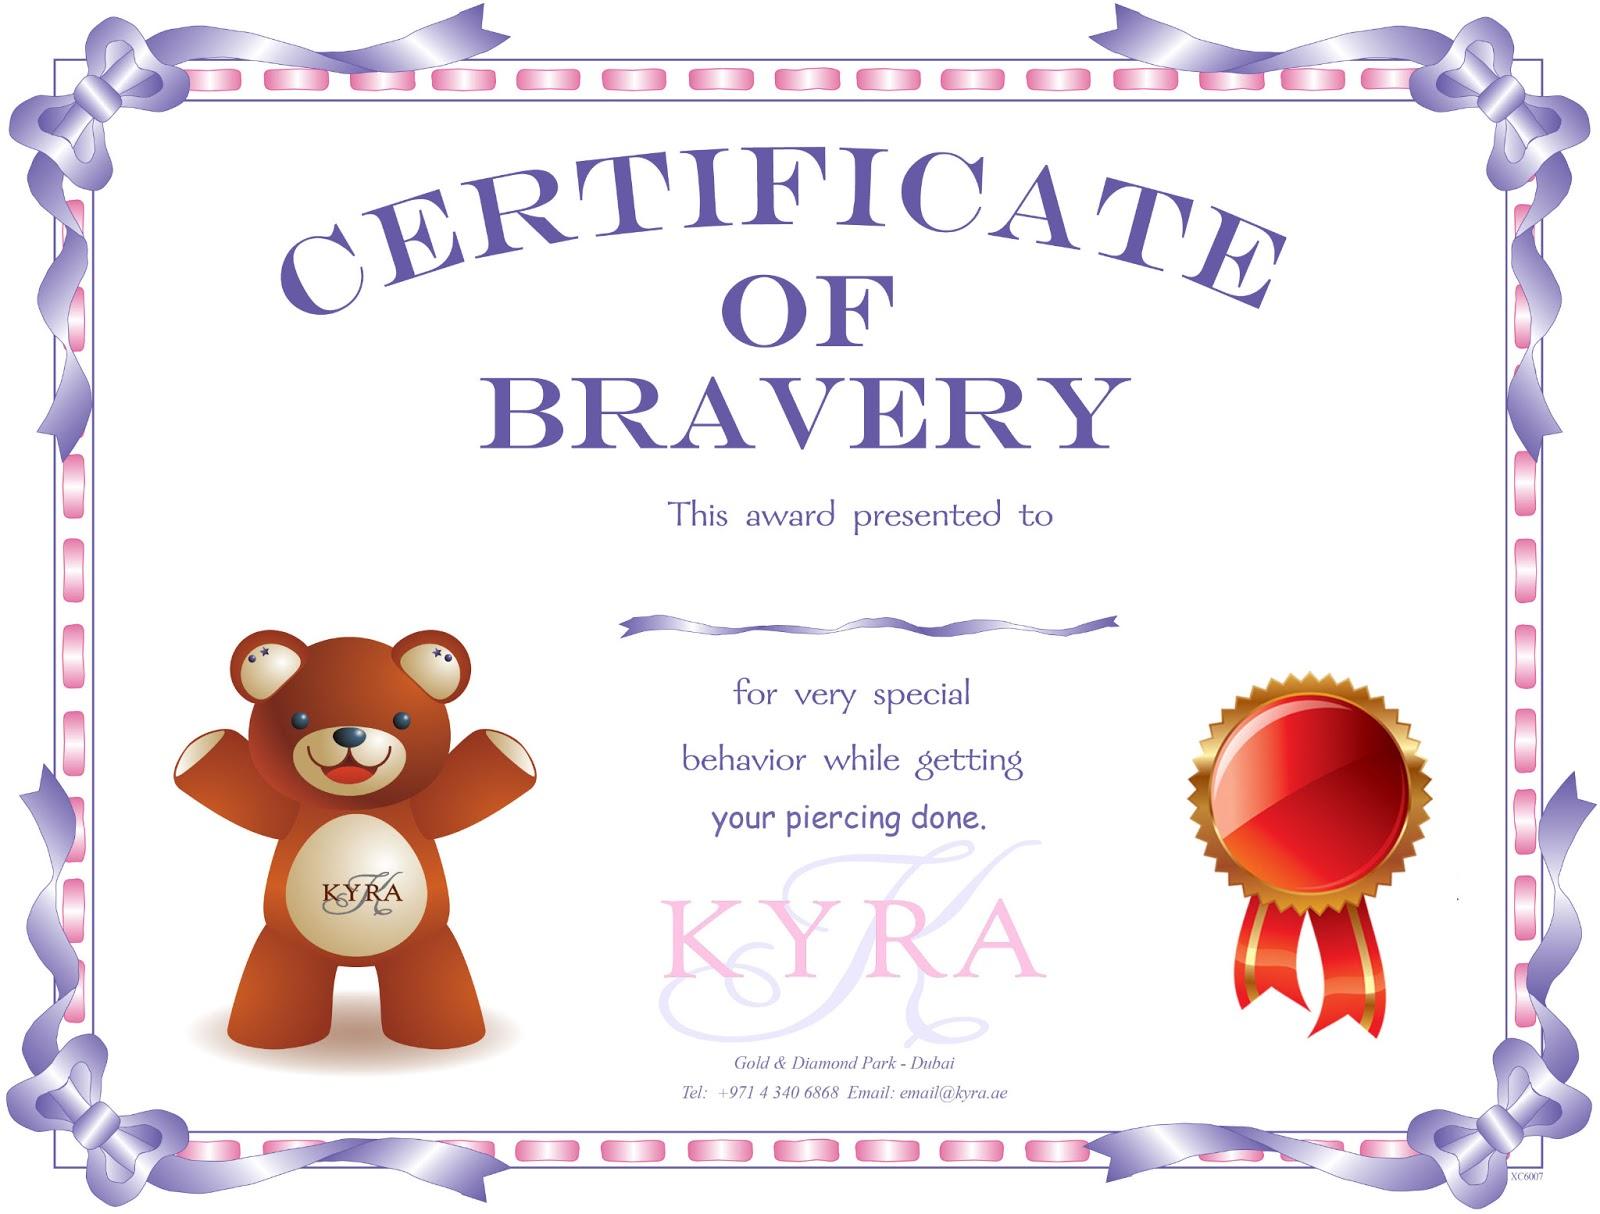 bravery certificate template - certificate of